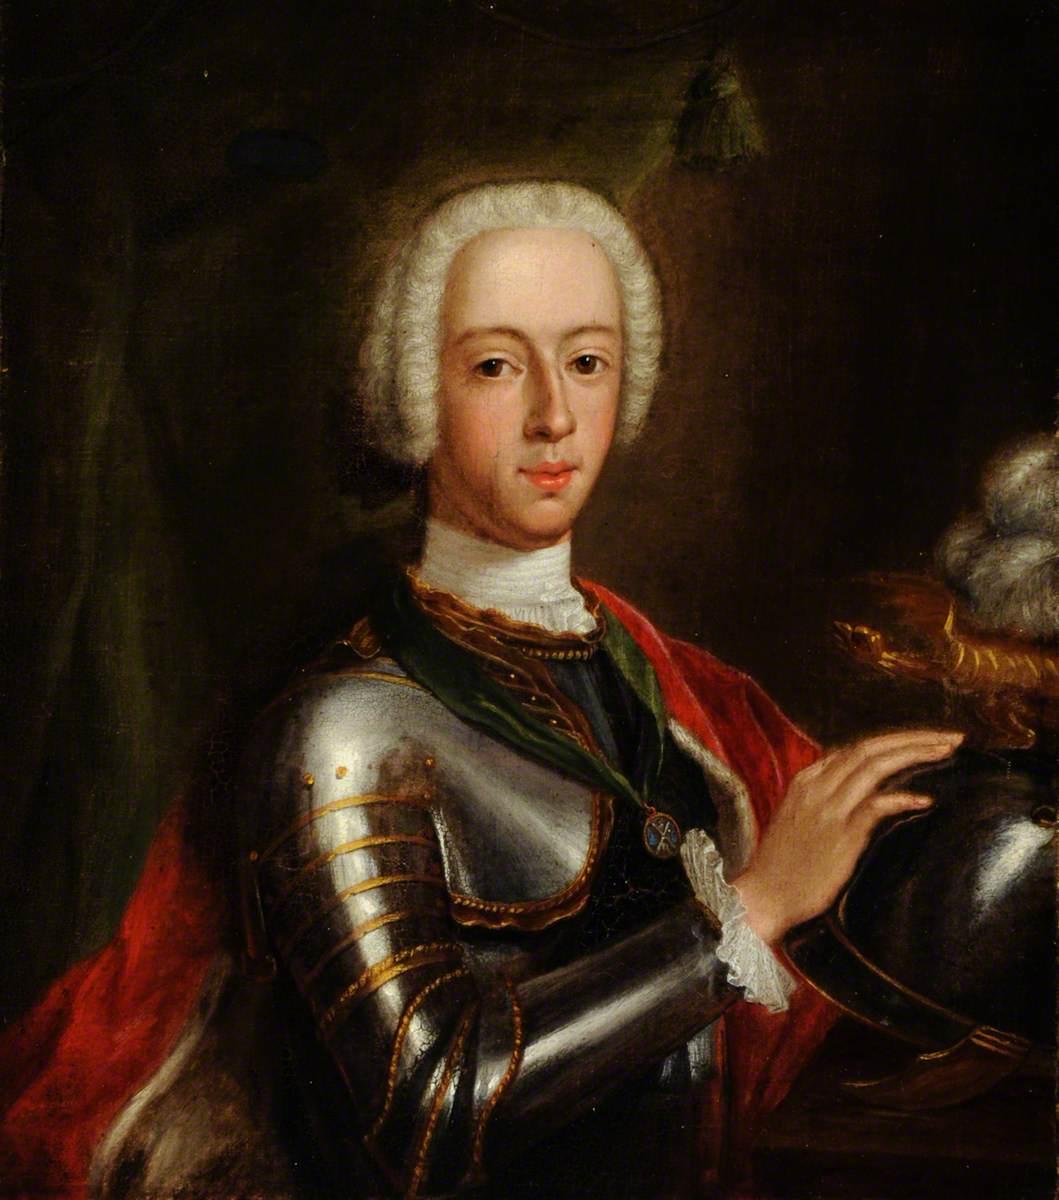 Prince Charles Edward Stuart (1720–1788), 'Bonnie Prince Charlie', 'The Young Pretender'